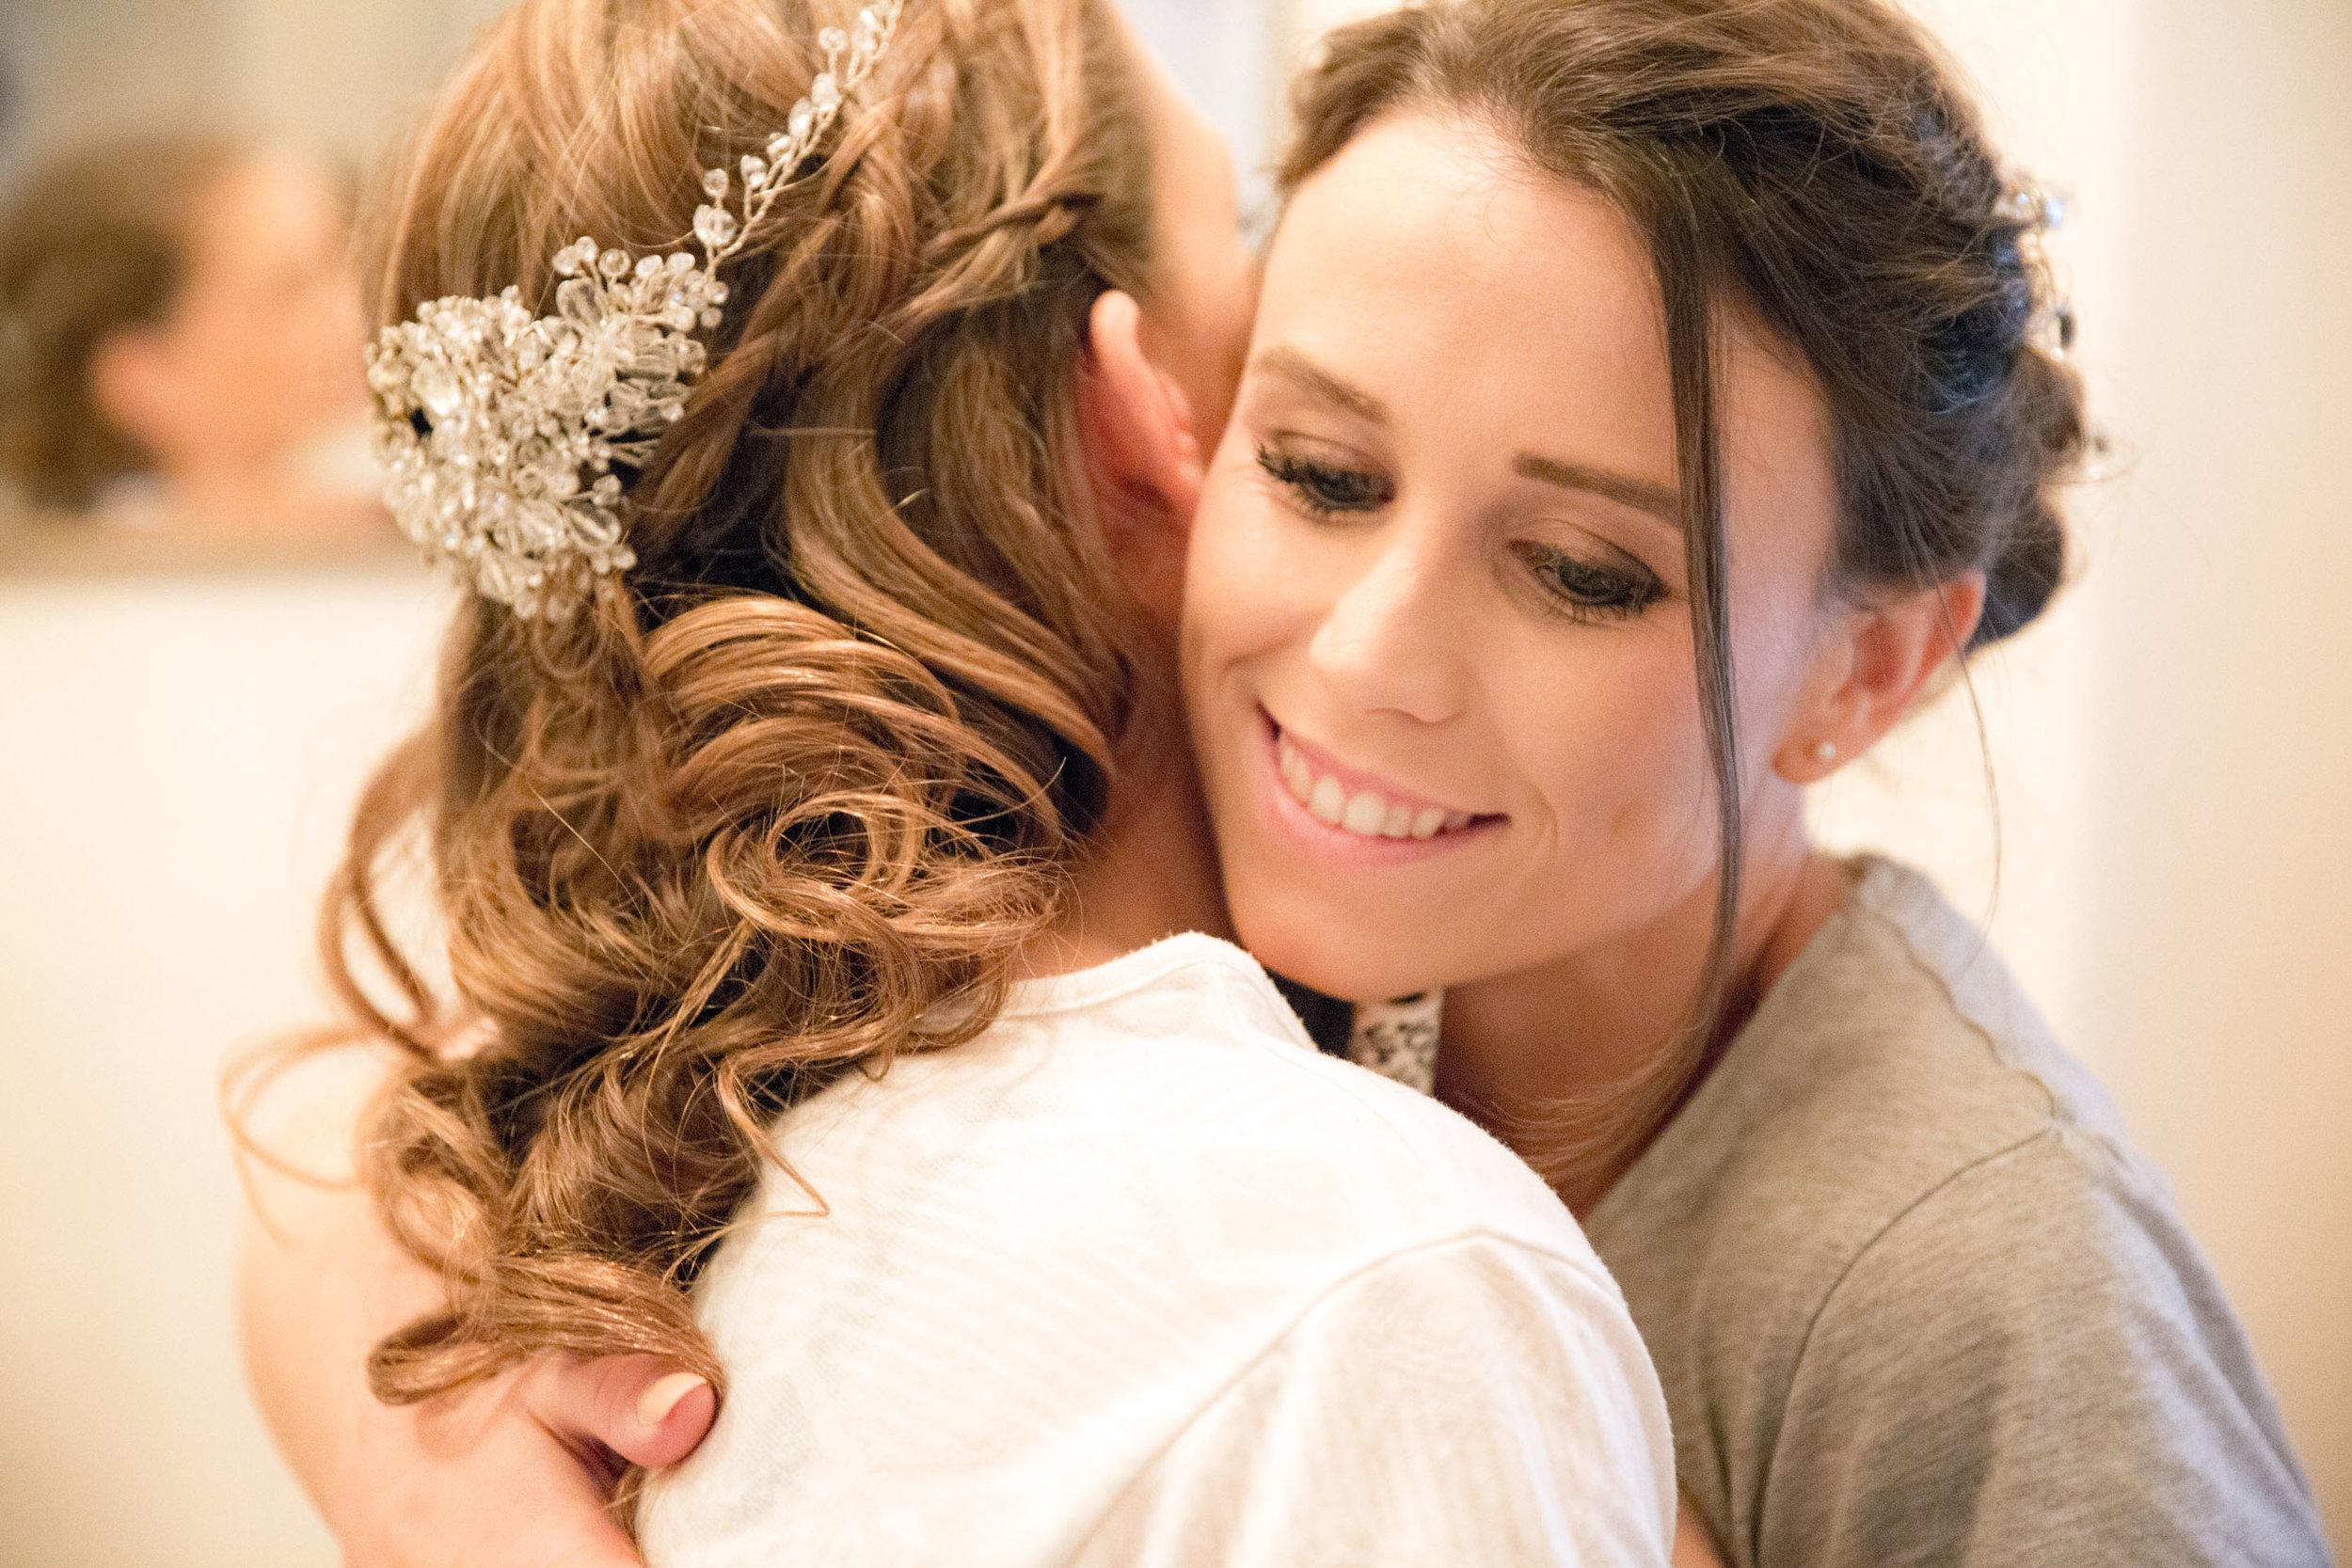 Jess & Ben - Bristol Wedding Photographer - Wright Wedding Photography - 38